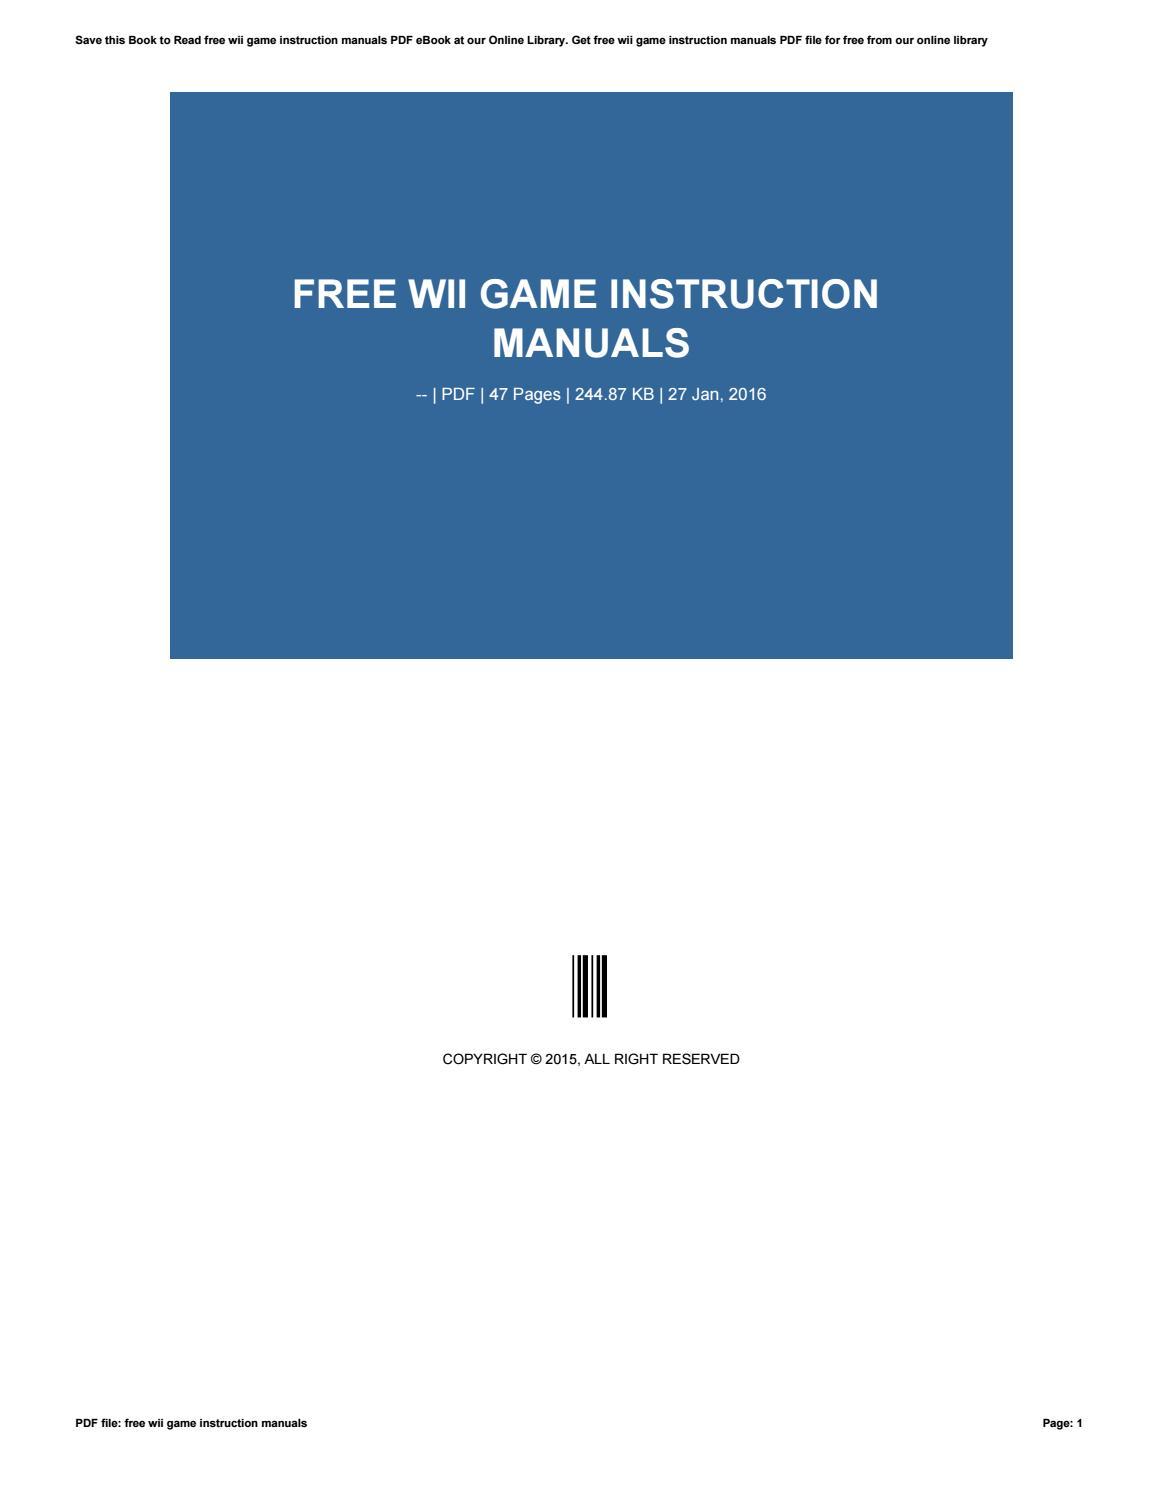 Nintendo wii cyberbike instruction manual.